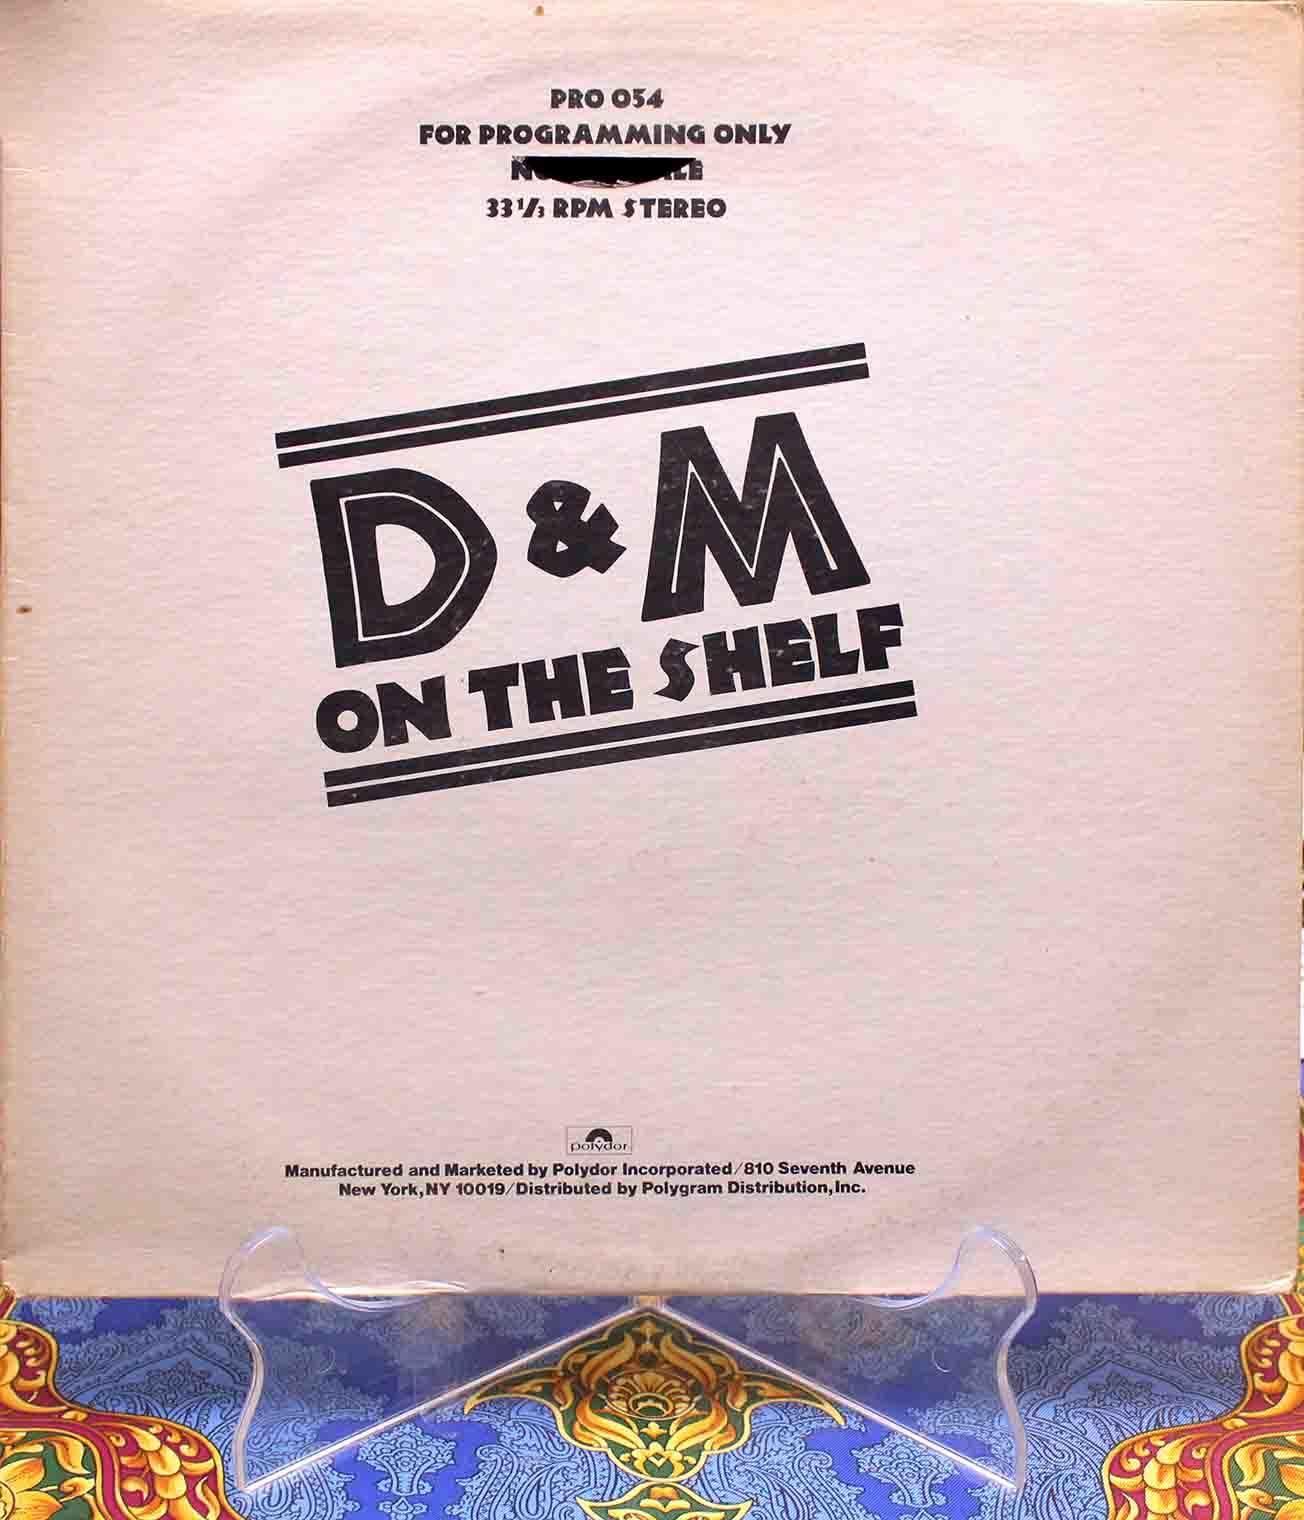 Donny Marie Osmond On The Shelf 01